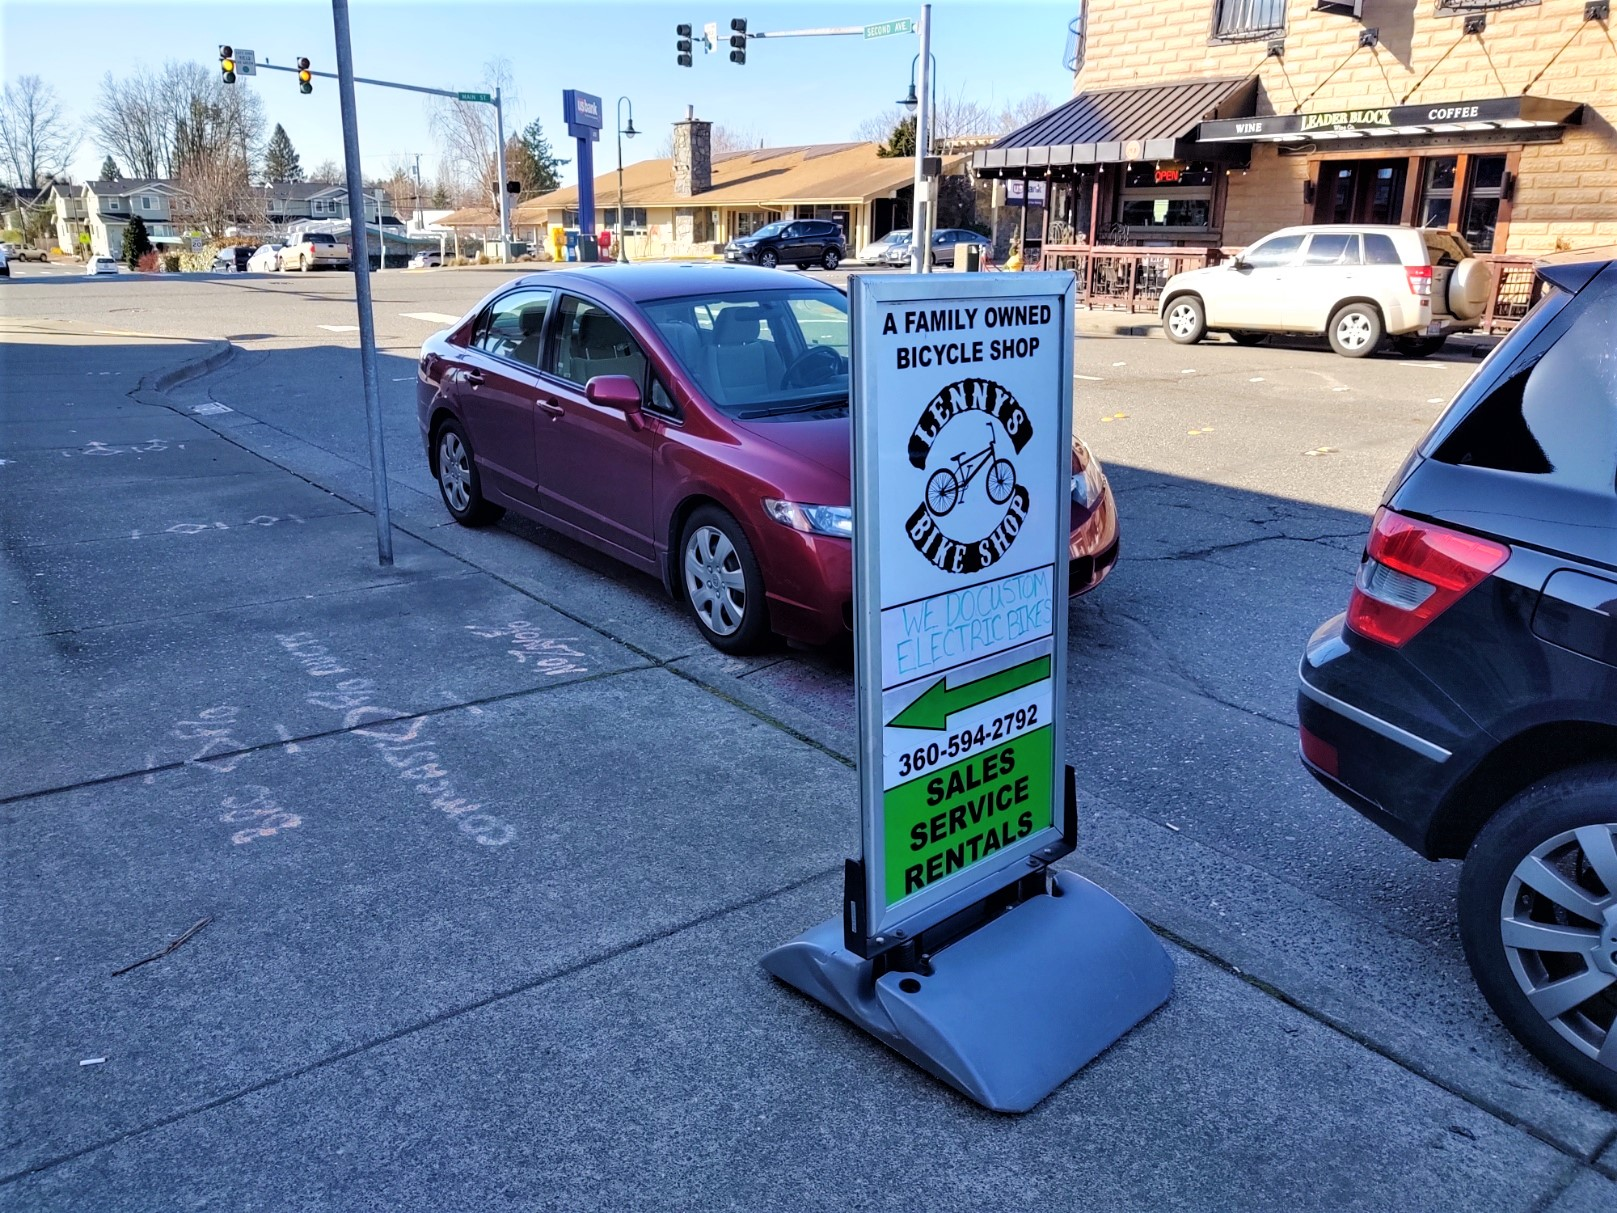 Sidewalk sign outside Lenny's Bike Shop (February 20, 2020). Photo: My Ferndale News